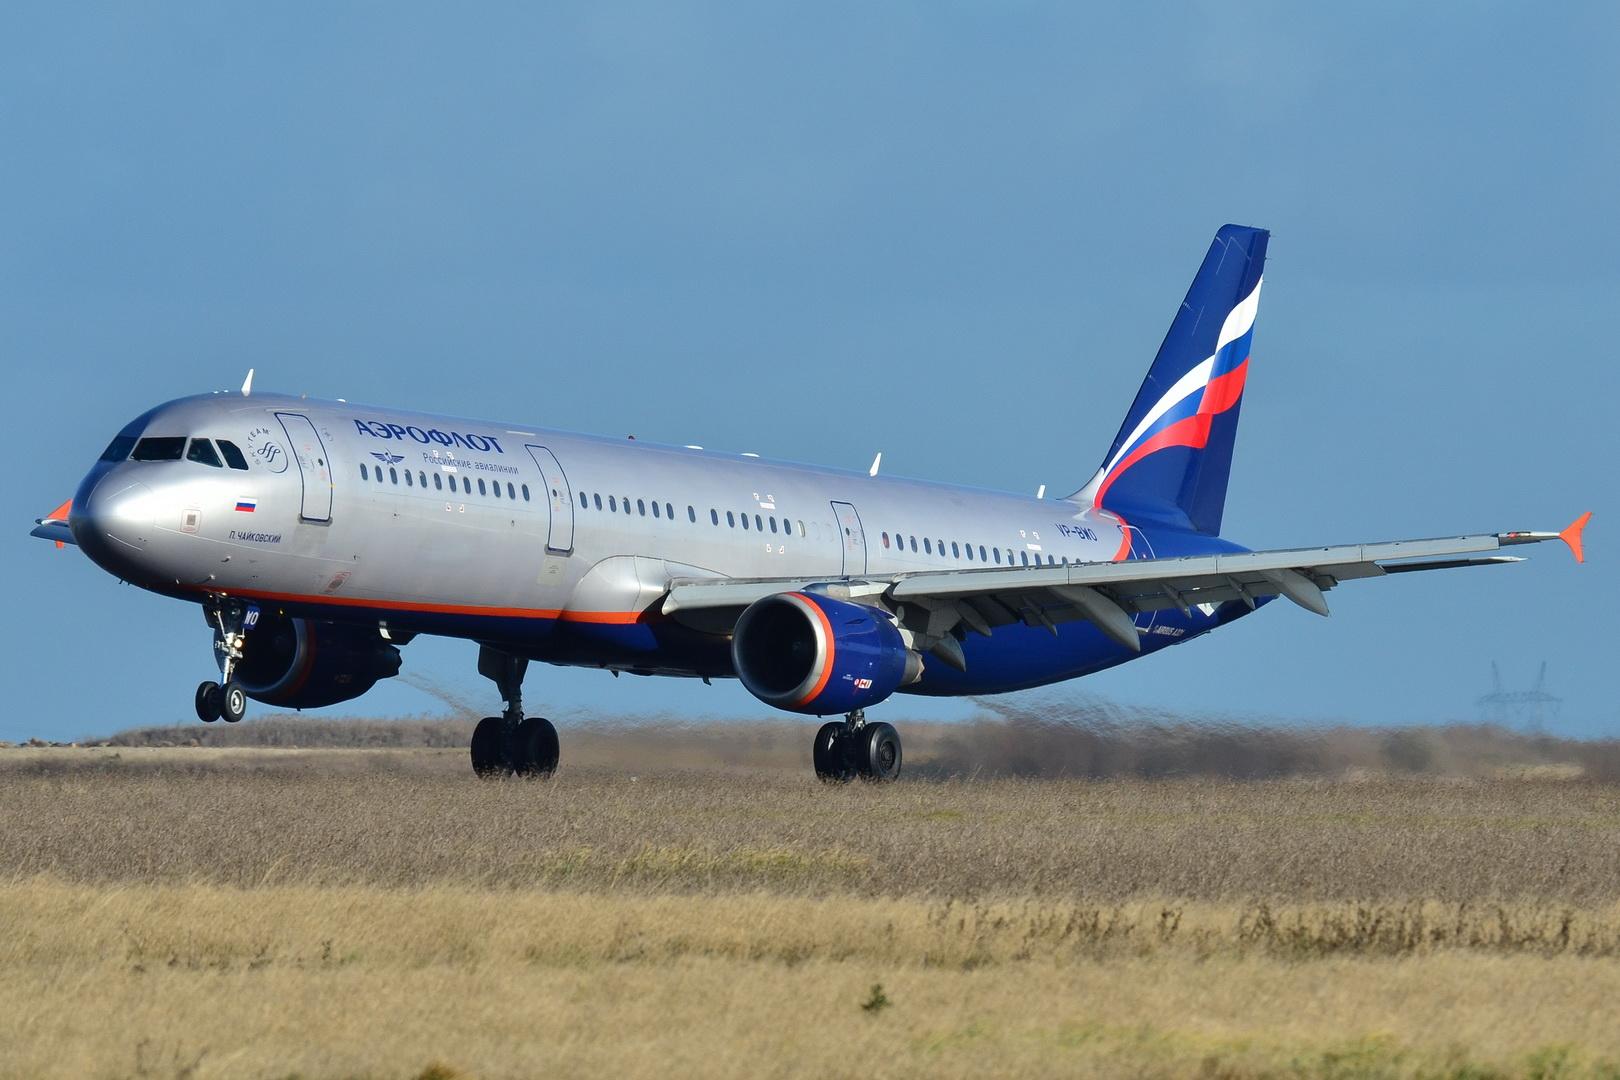 File:Airbus A321-200 Aeroflot (AFL) VP-BWO - MSN 2337